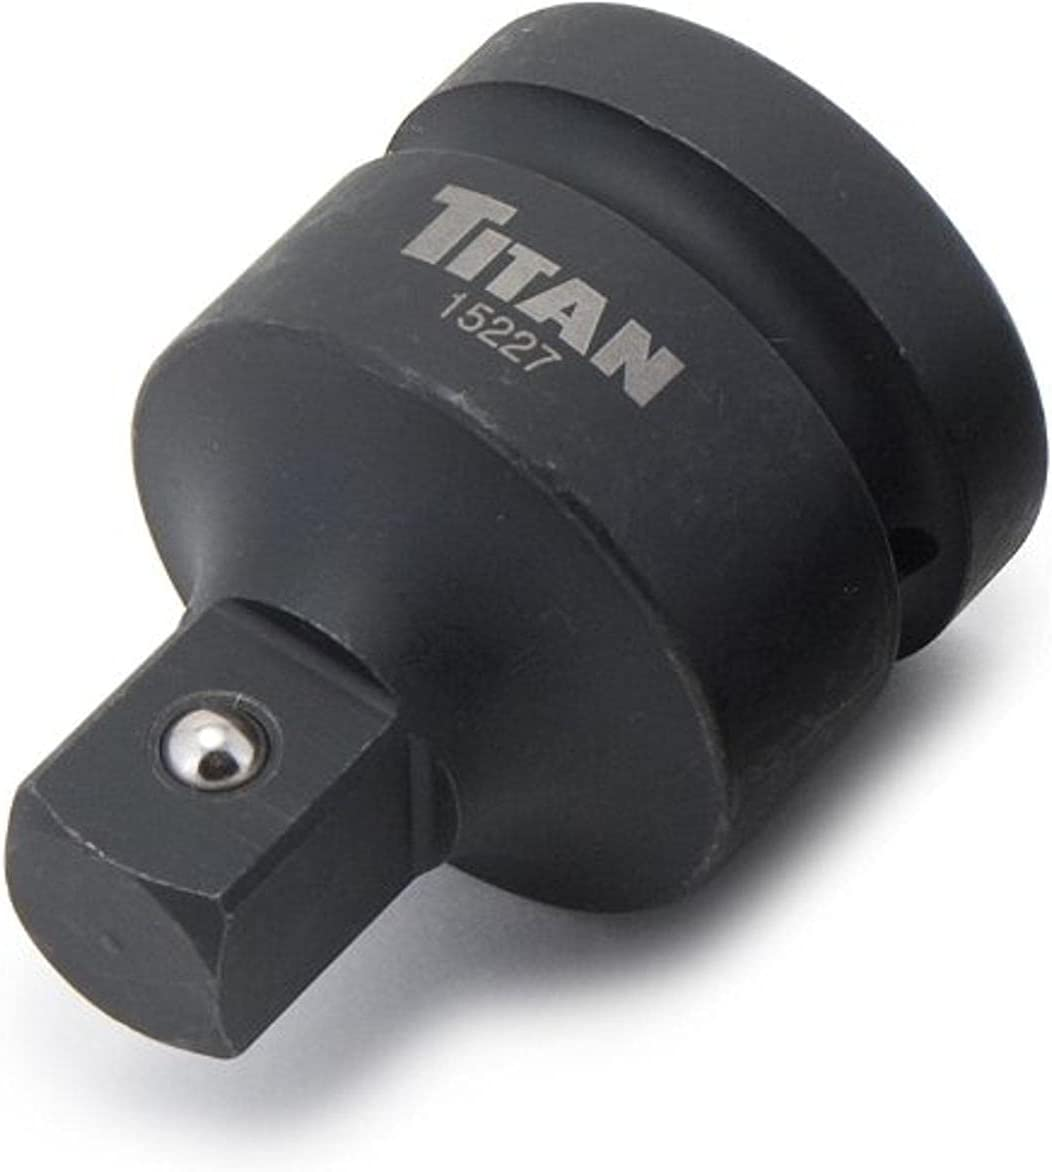 "Titan 15227 1"" Female to 3/4"" Male Impact Socket Adaptor - - Amazon.com"